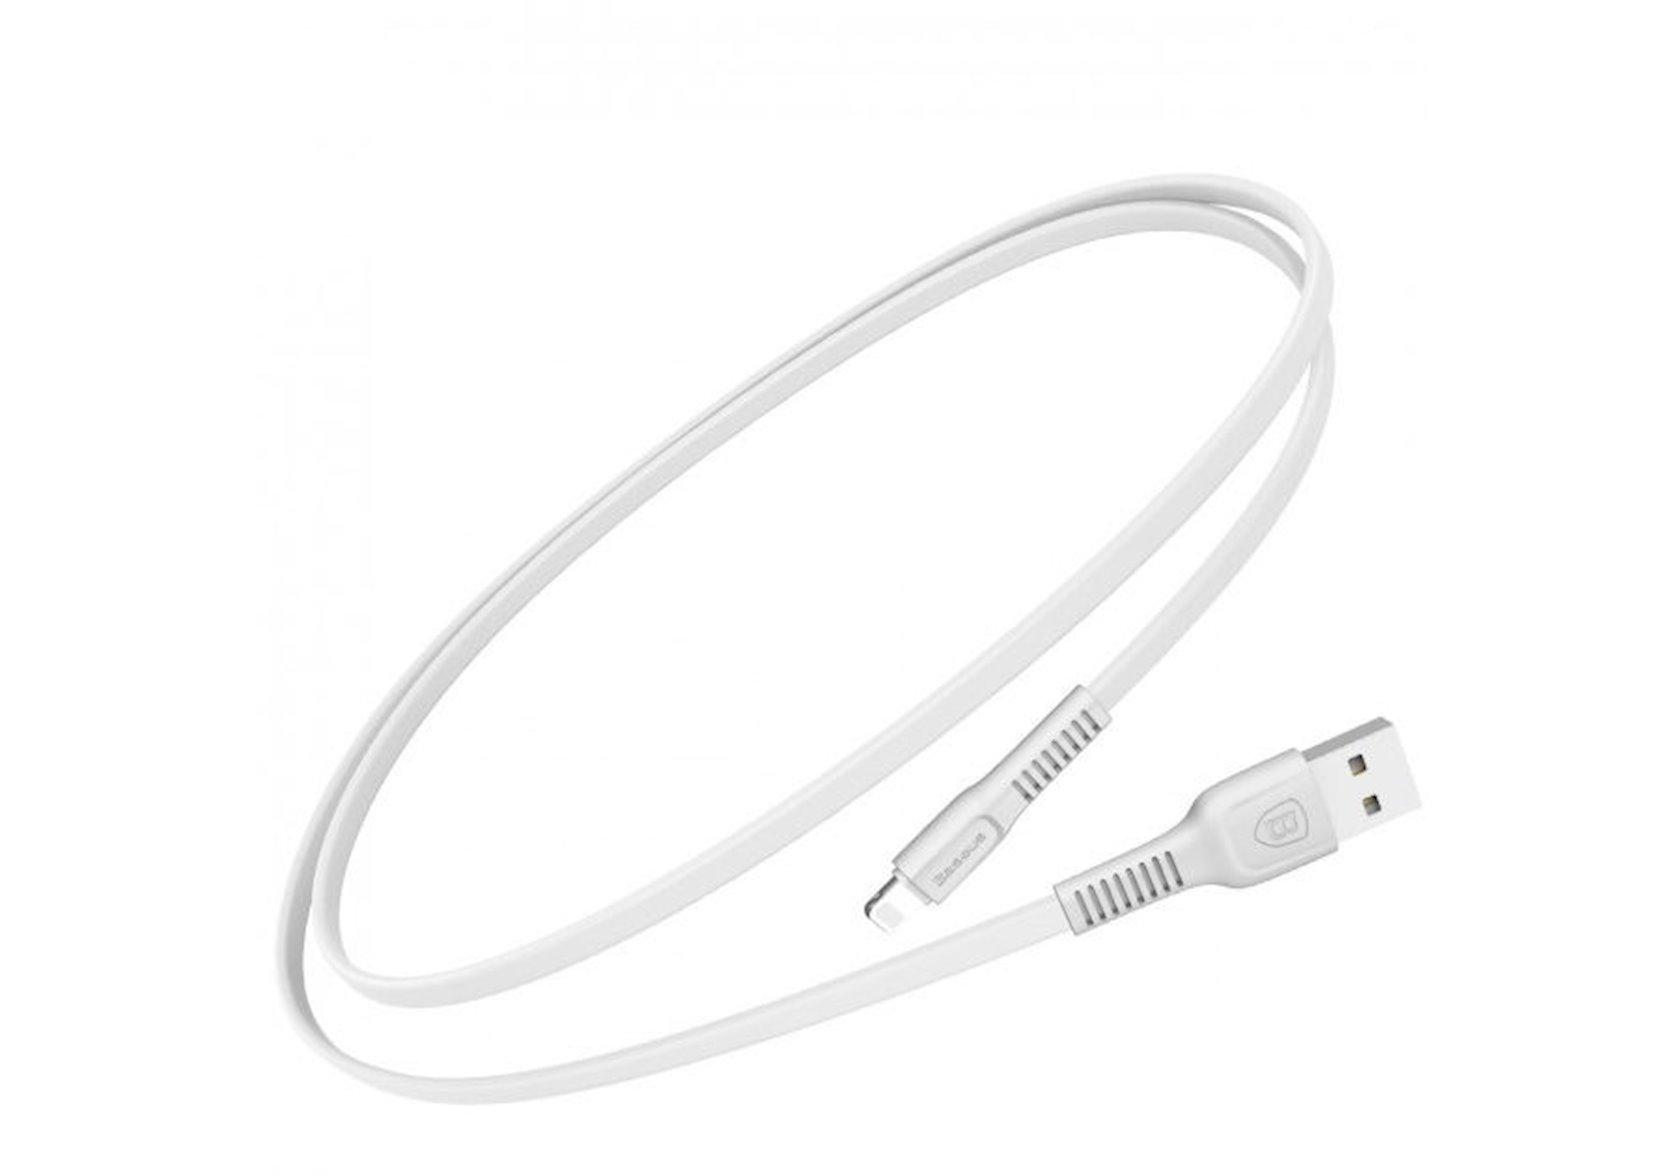 USB Kabel işıqlı 1m Baseus Tough Series Calzy-B02, ağ